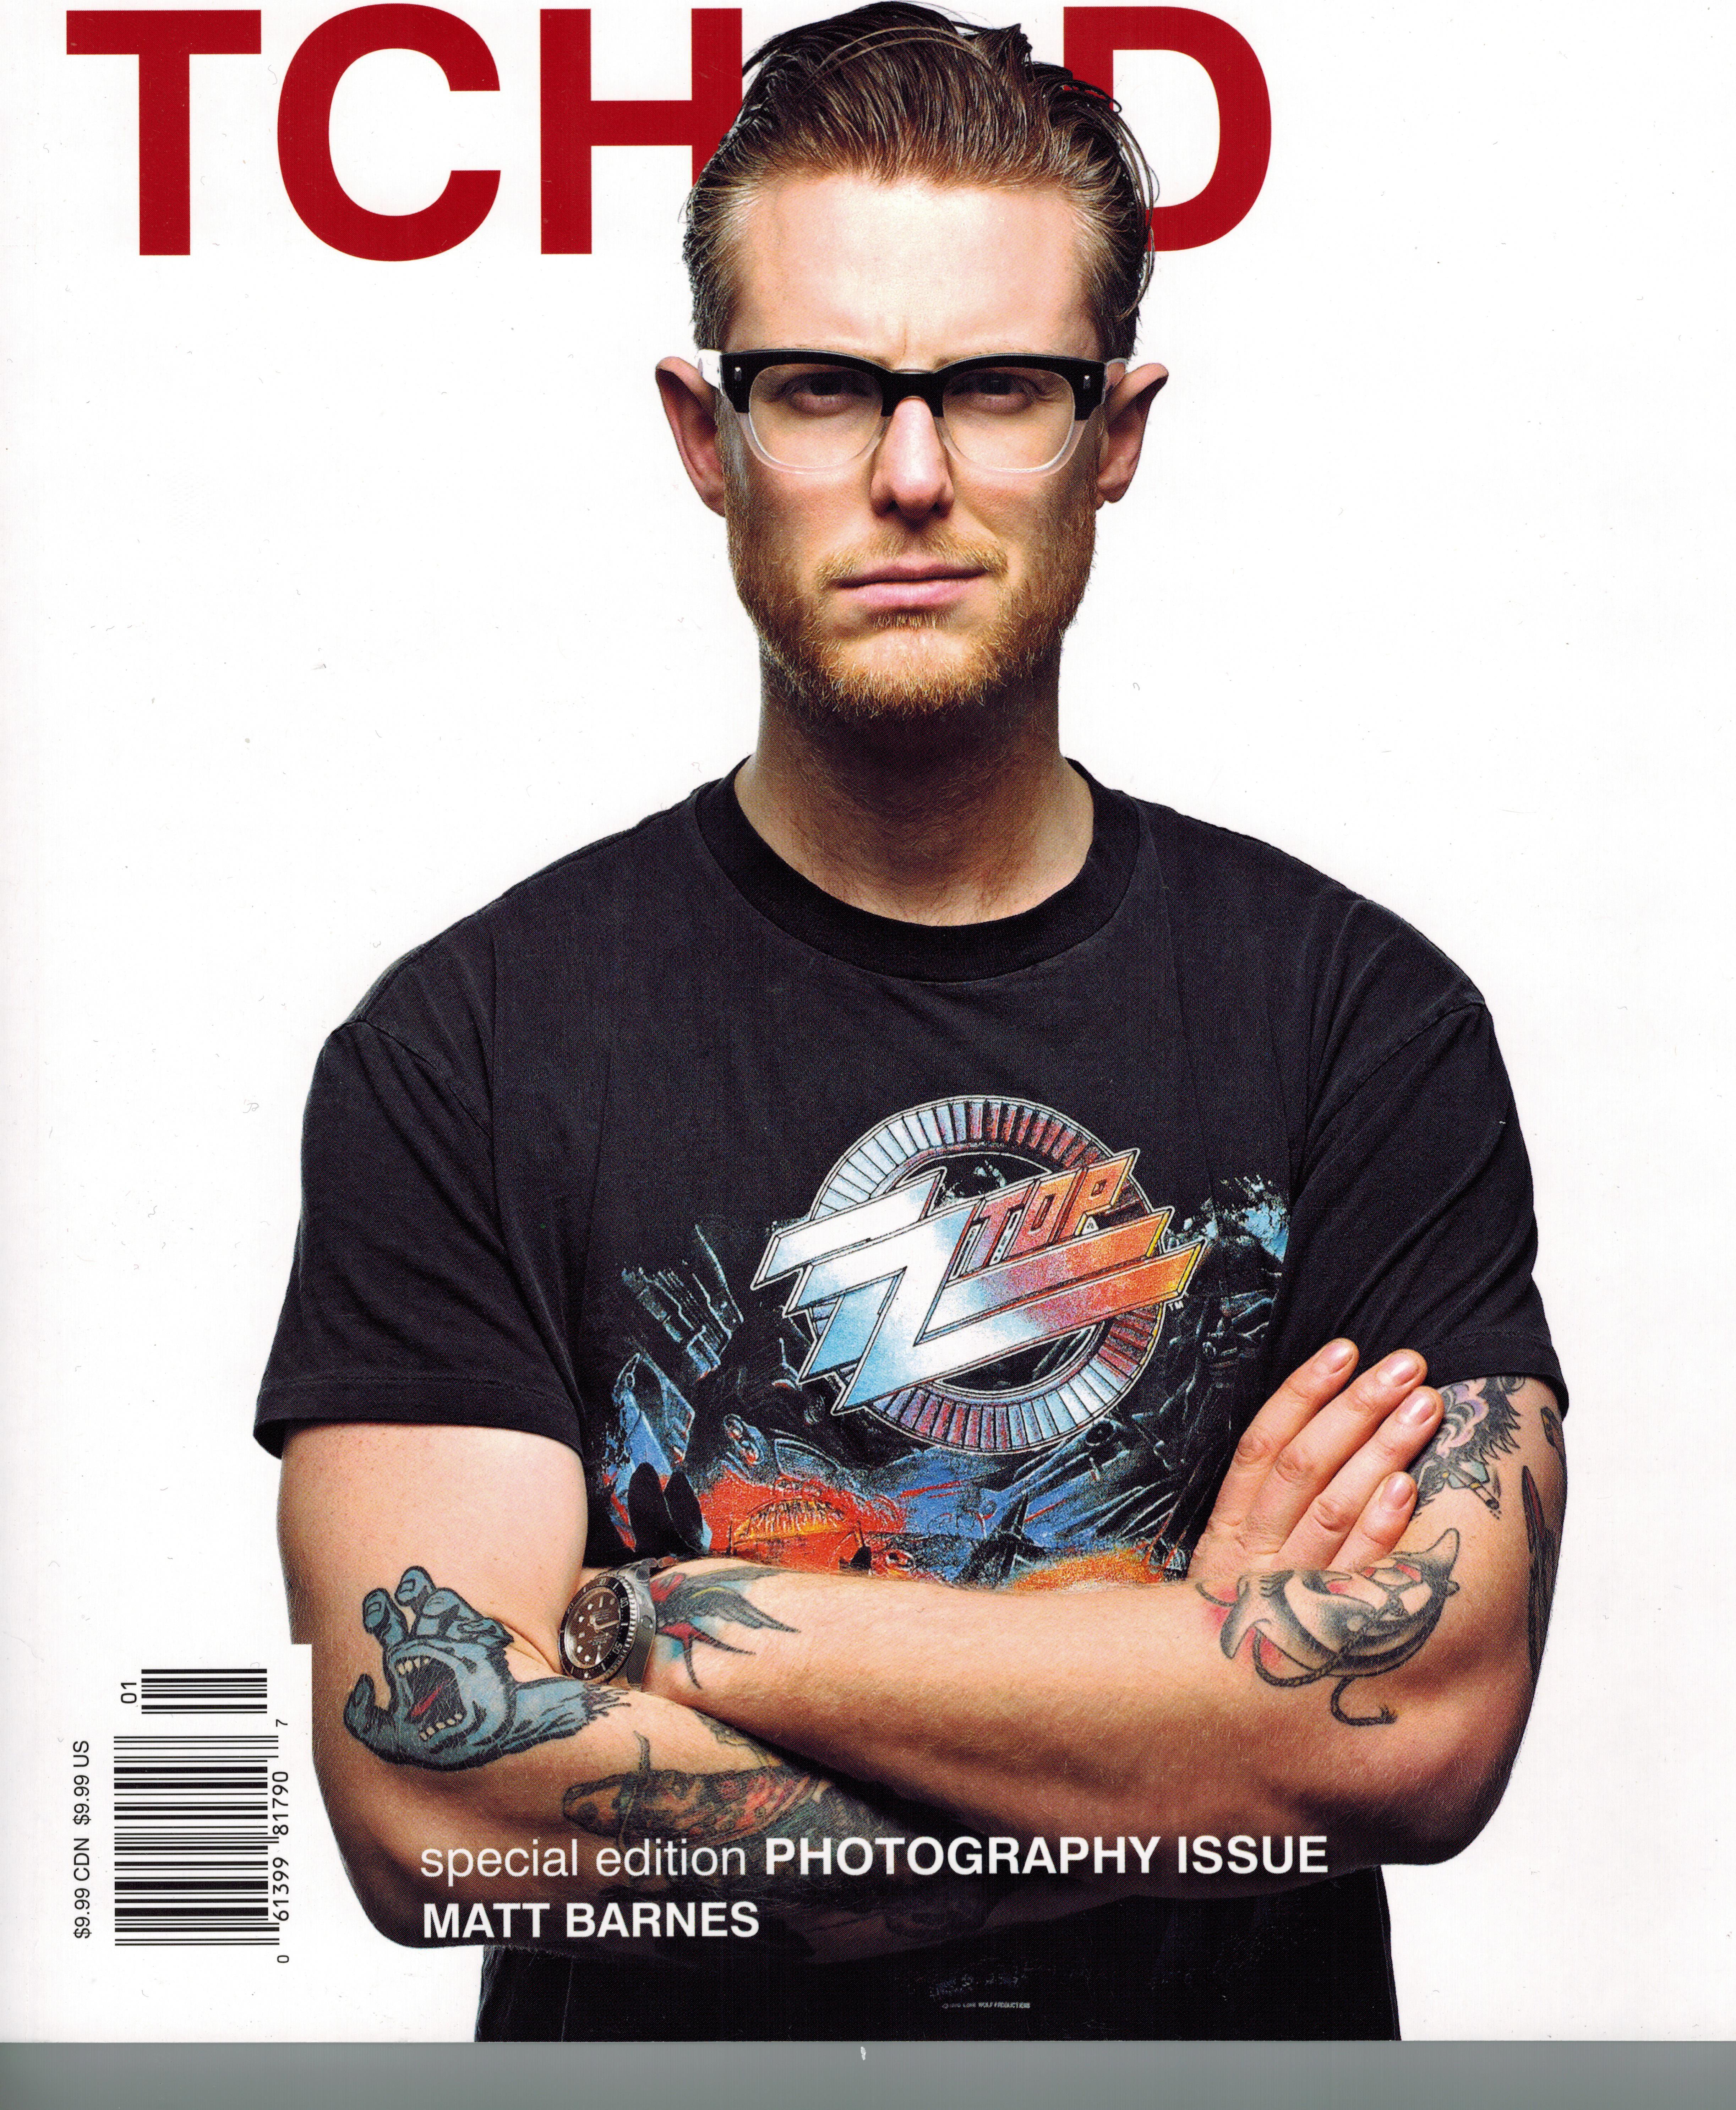 #Canadian photographer #MattBarnes wears Cutler & Gross frames on the cover of the latest issue of #Tchadmagazine. The 0772 model in Grad Black suits him perfectly http://9nl.eu/0772Gradblack #Toronto #Cutlerandgross #eyewear #Fashion